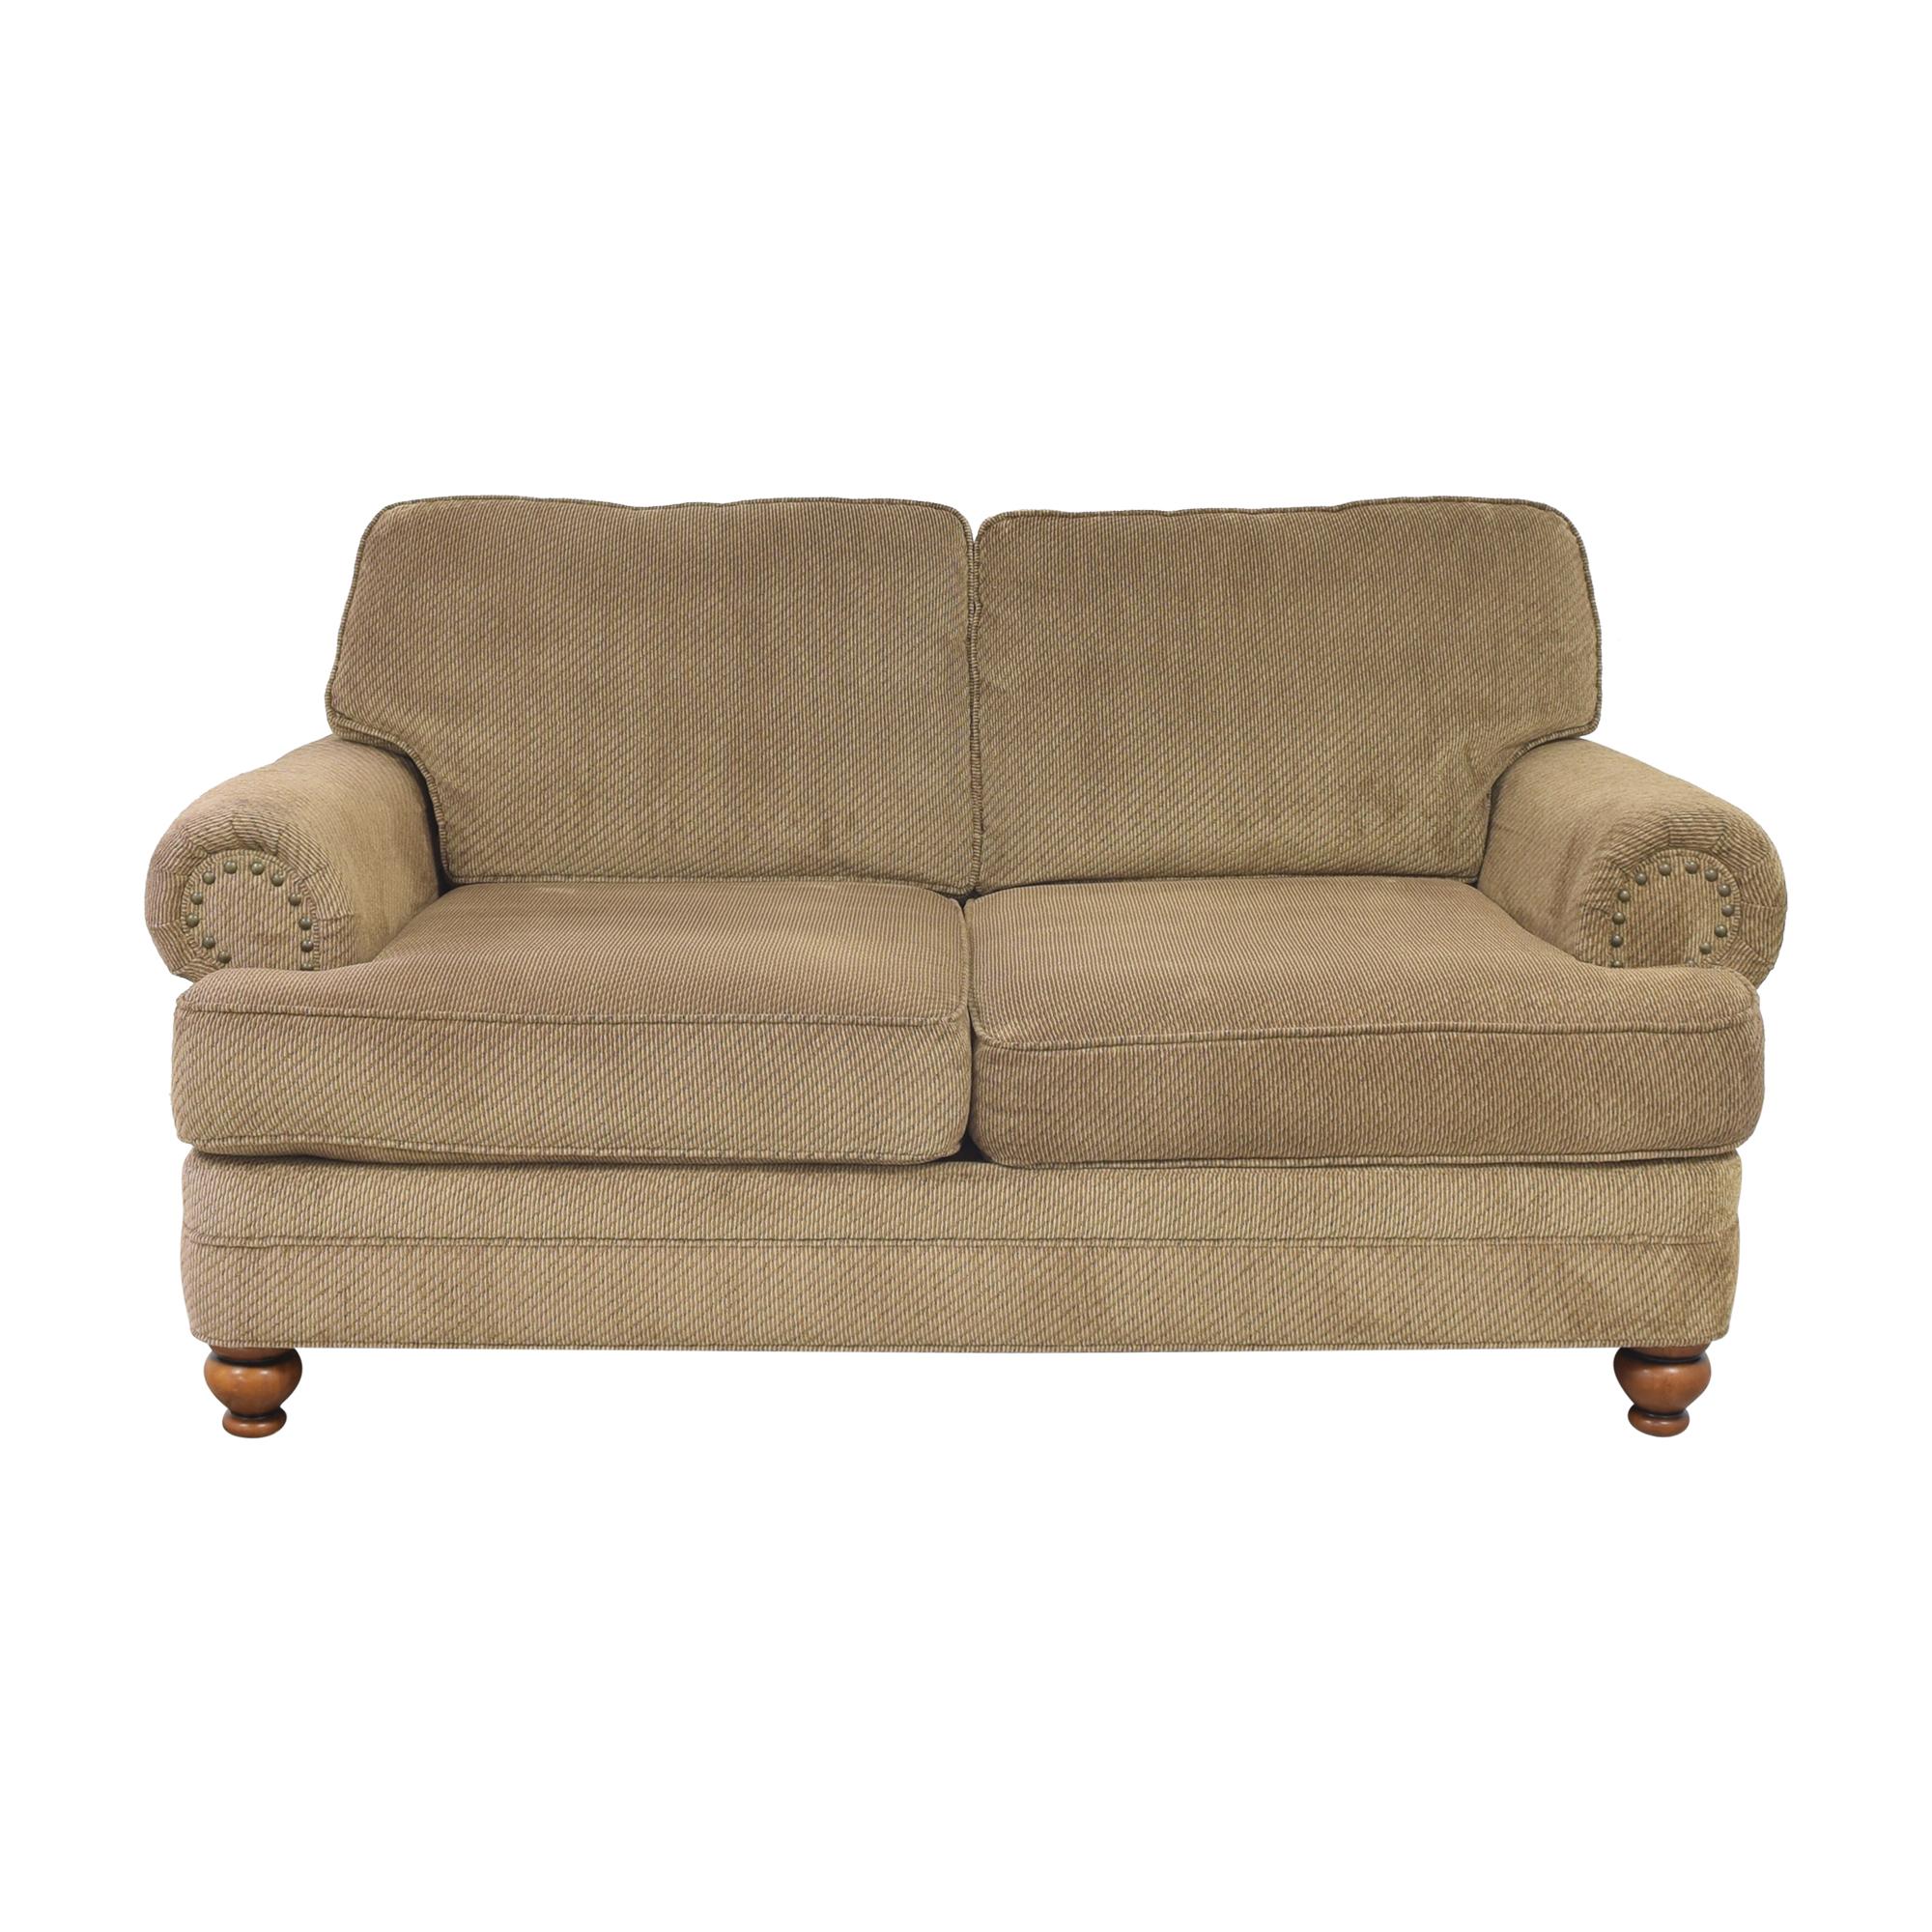 HM Richards Furniture HM Richards Furniture Tifton Loveseat ma